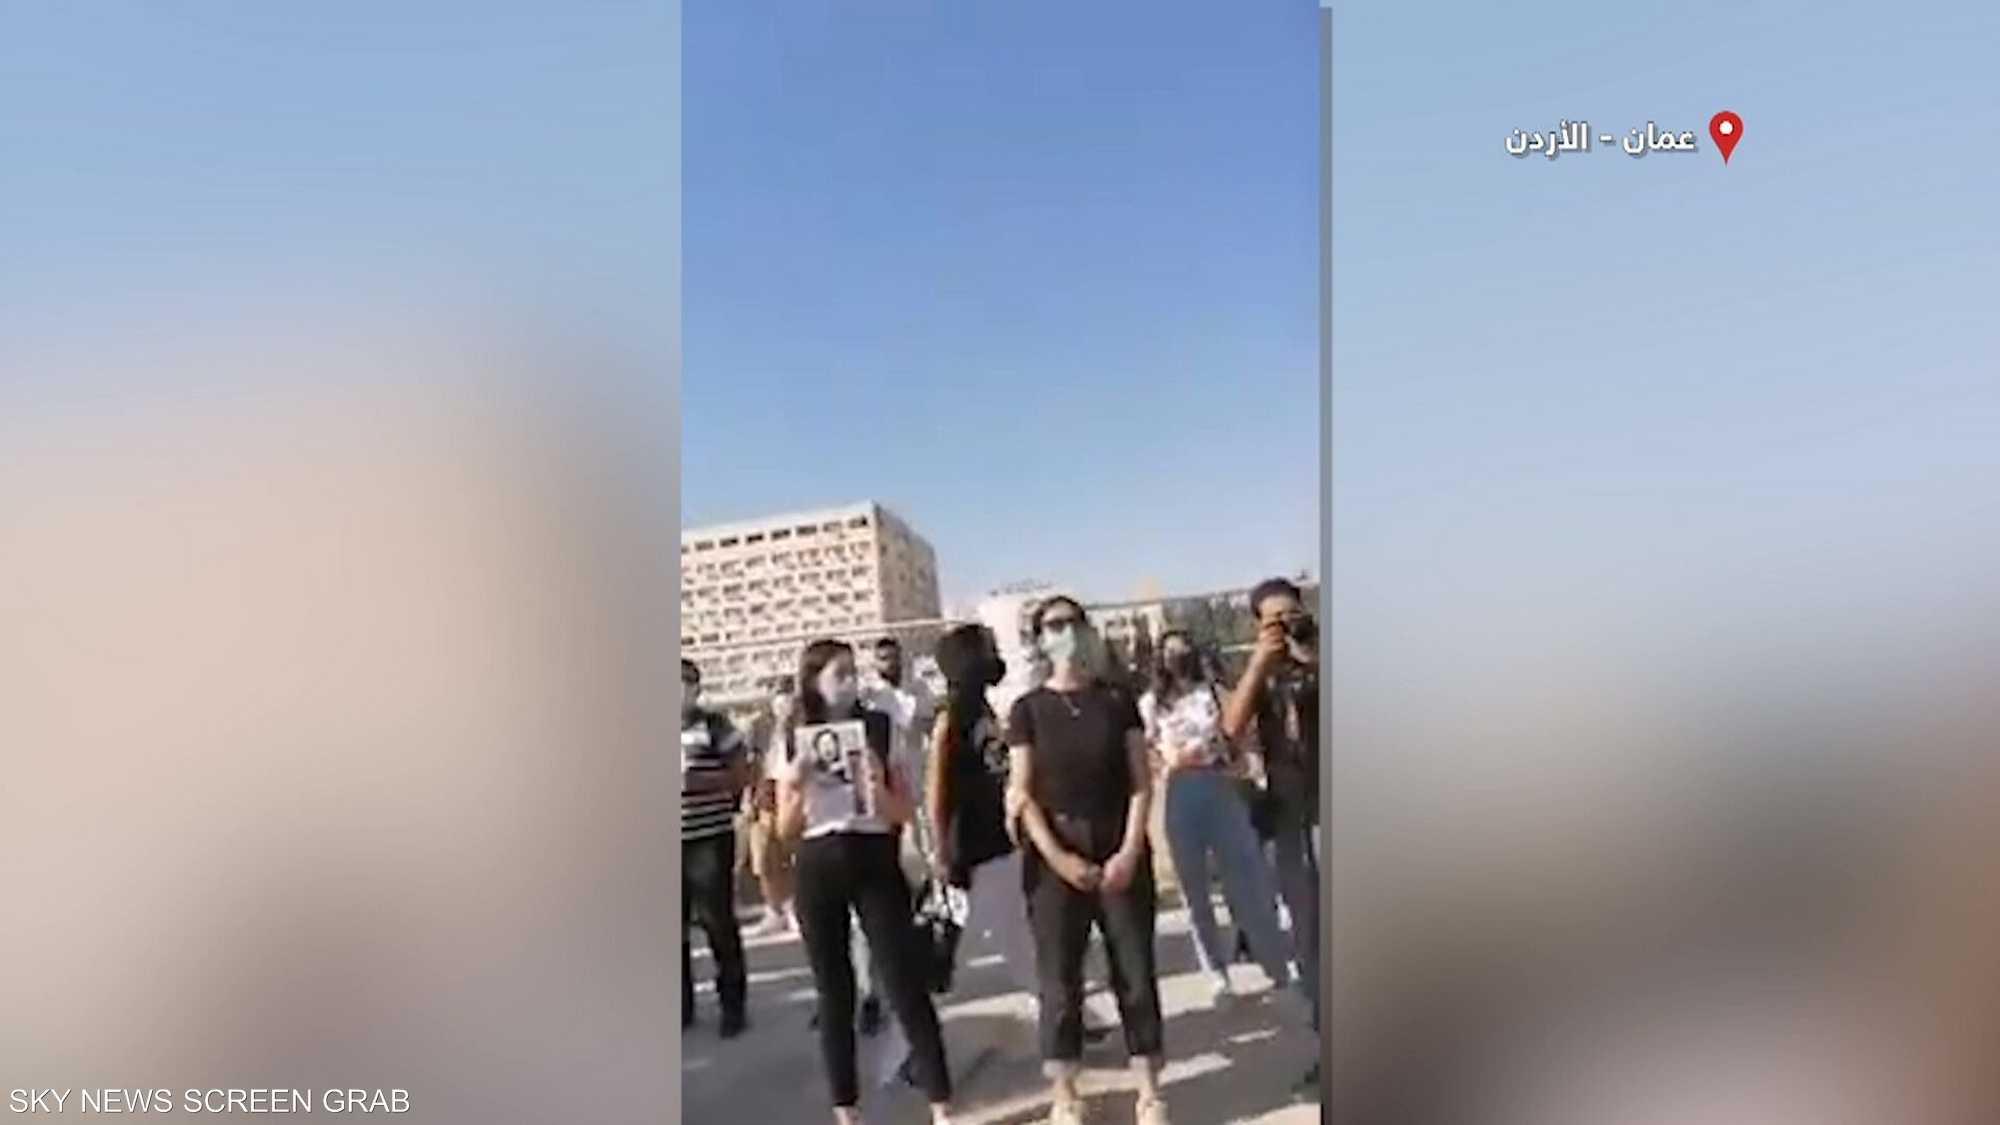 احتجاج حقوقي أردني بعنوان صرخات أحلام